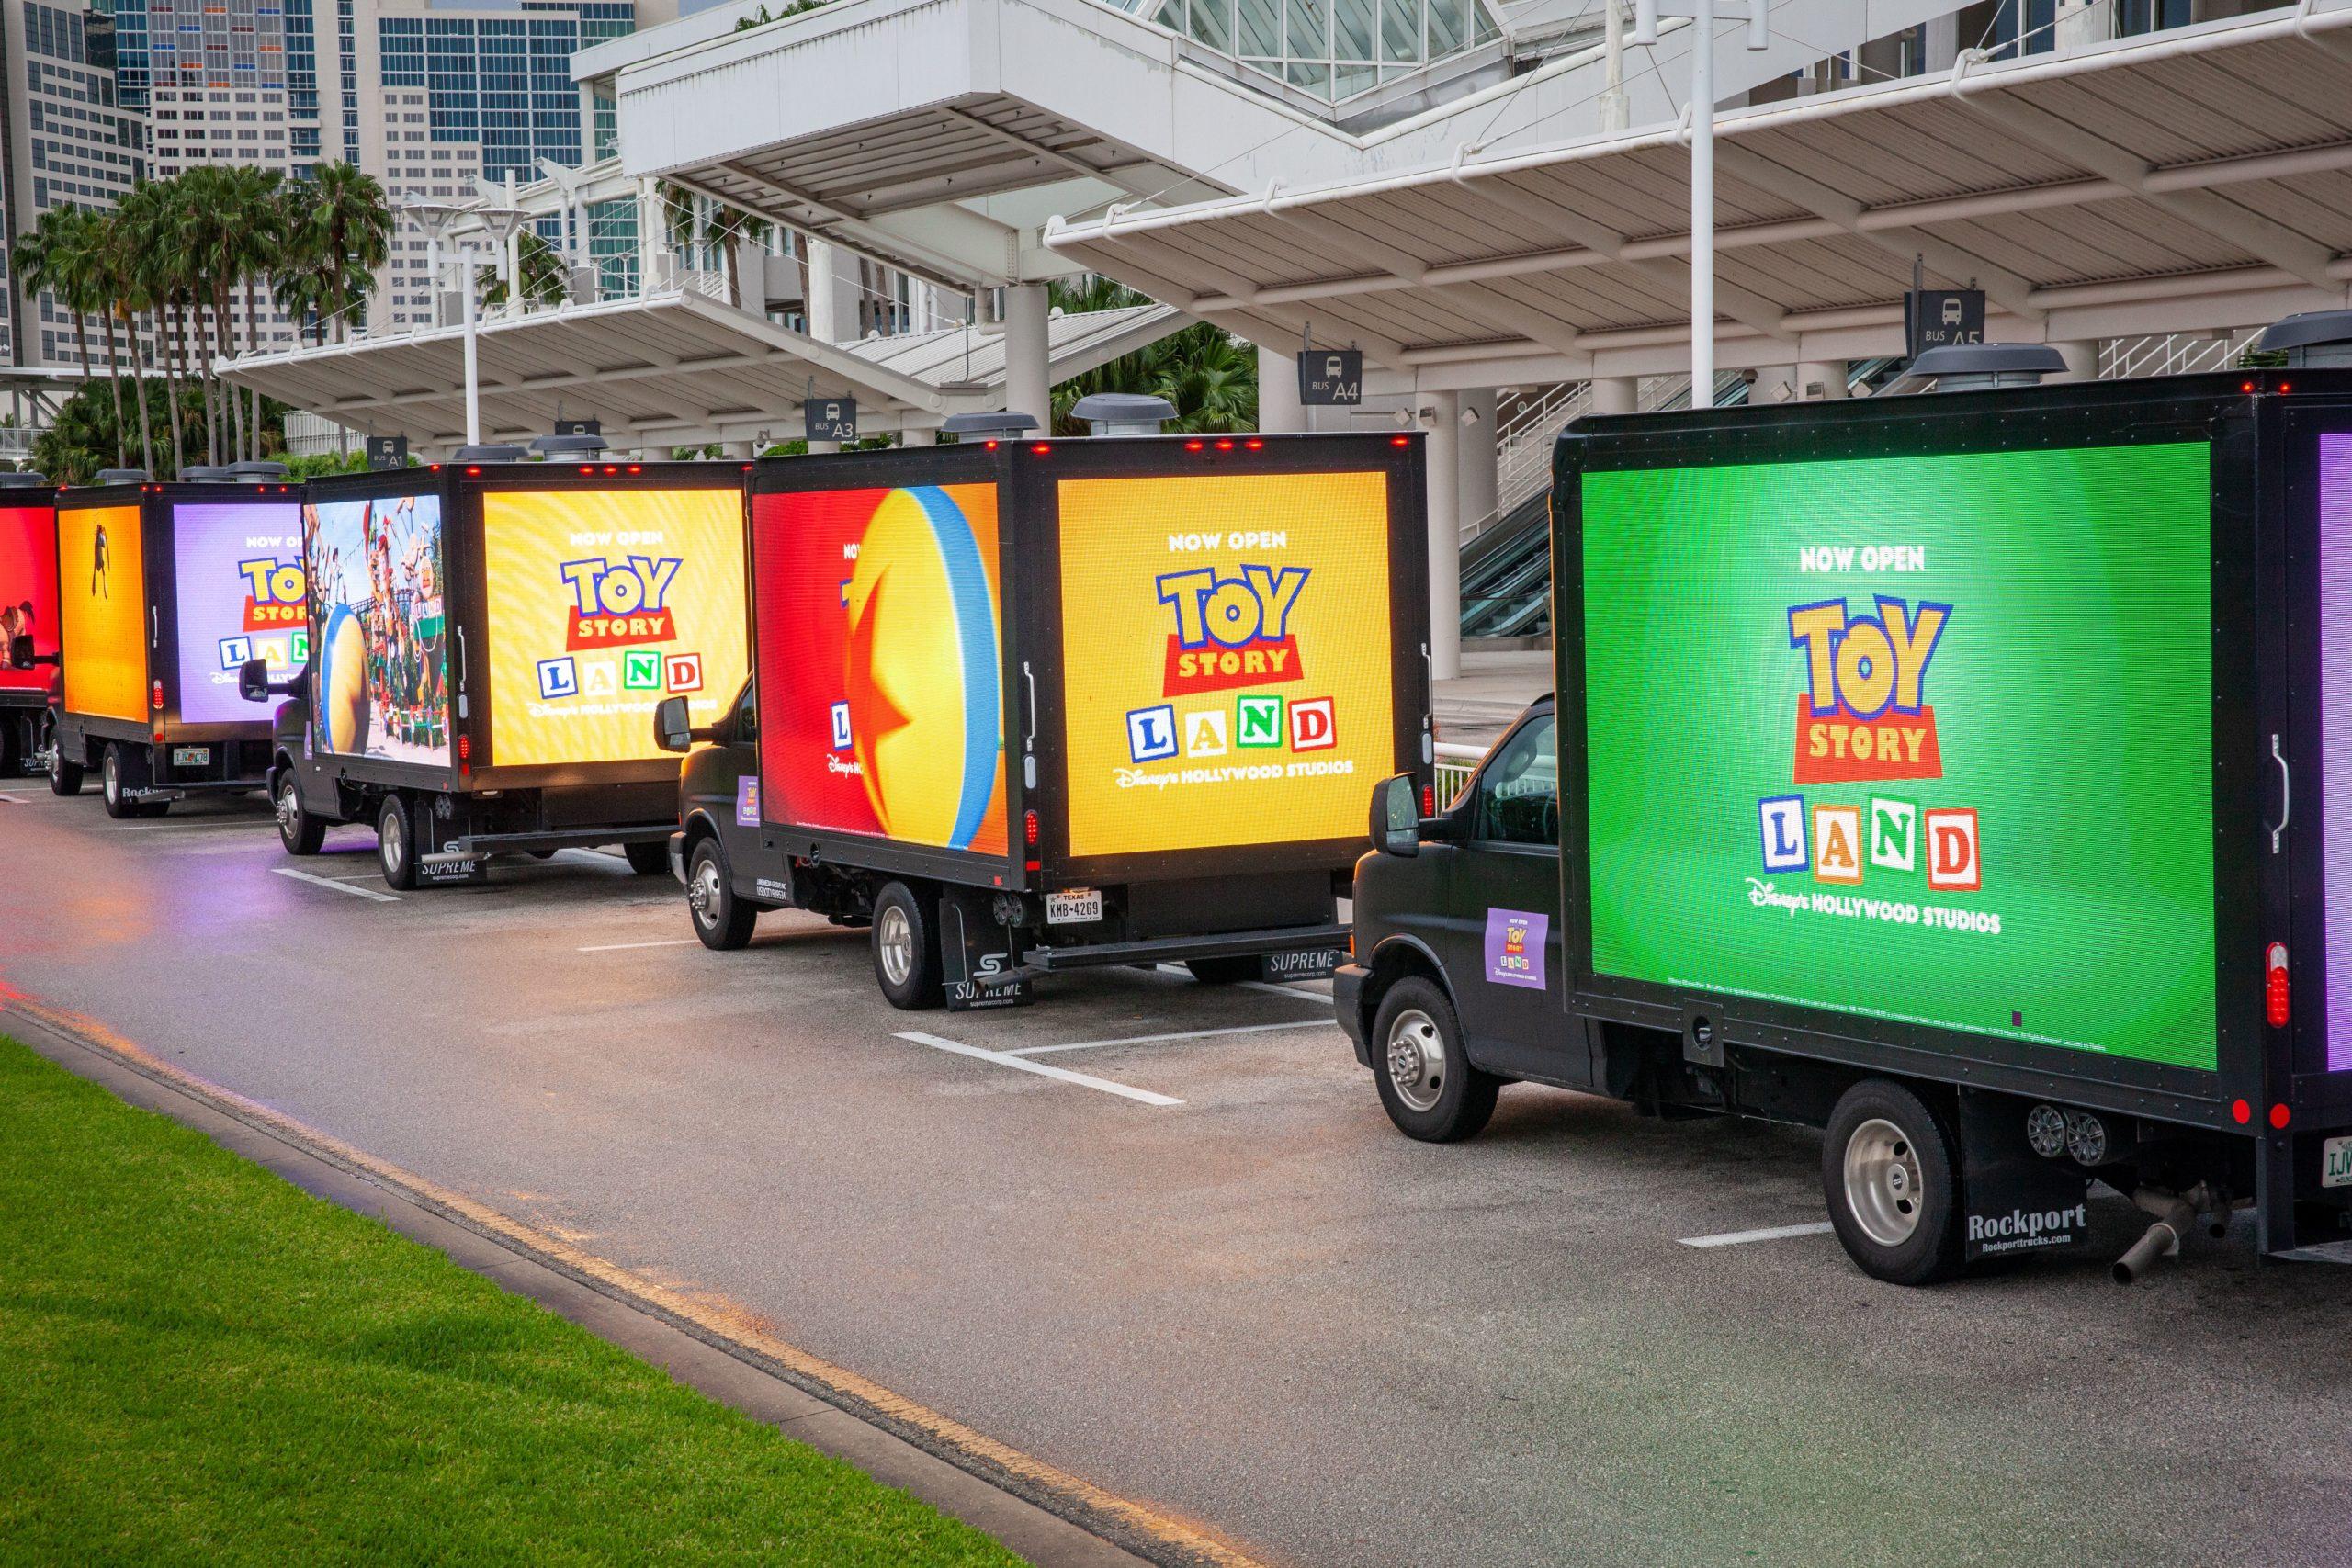 Smart LED Billboard Truck - Toy Story